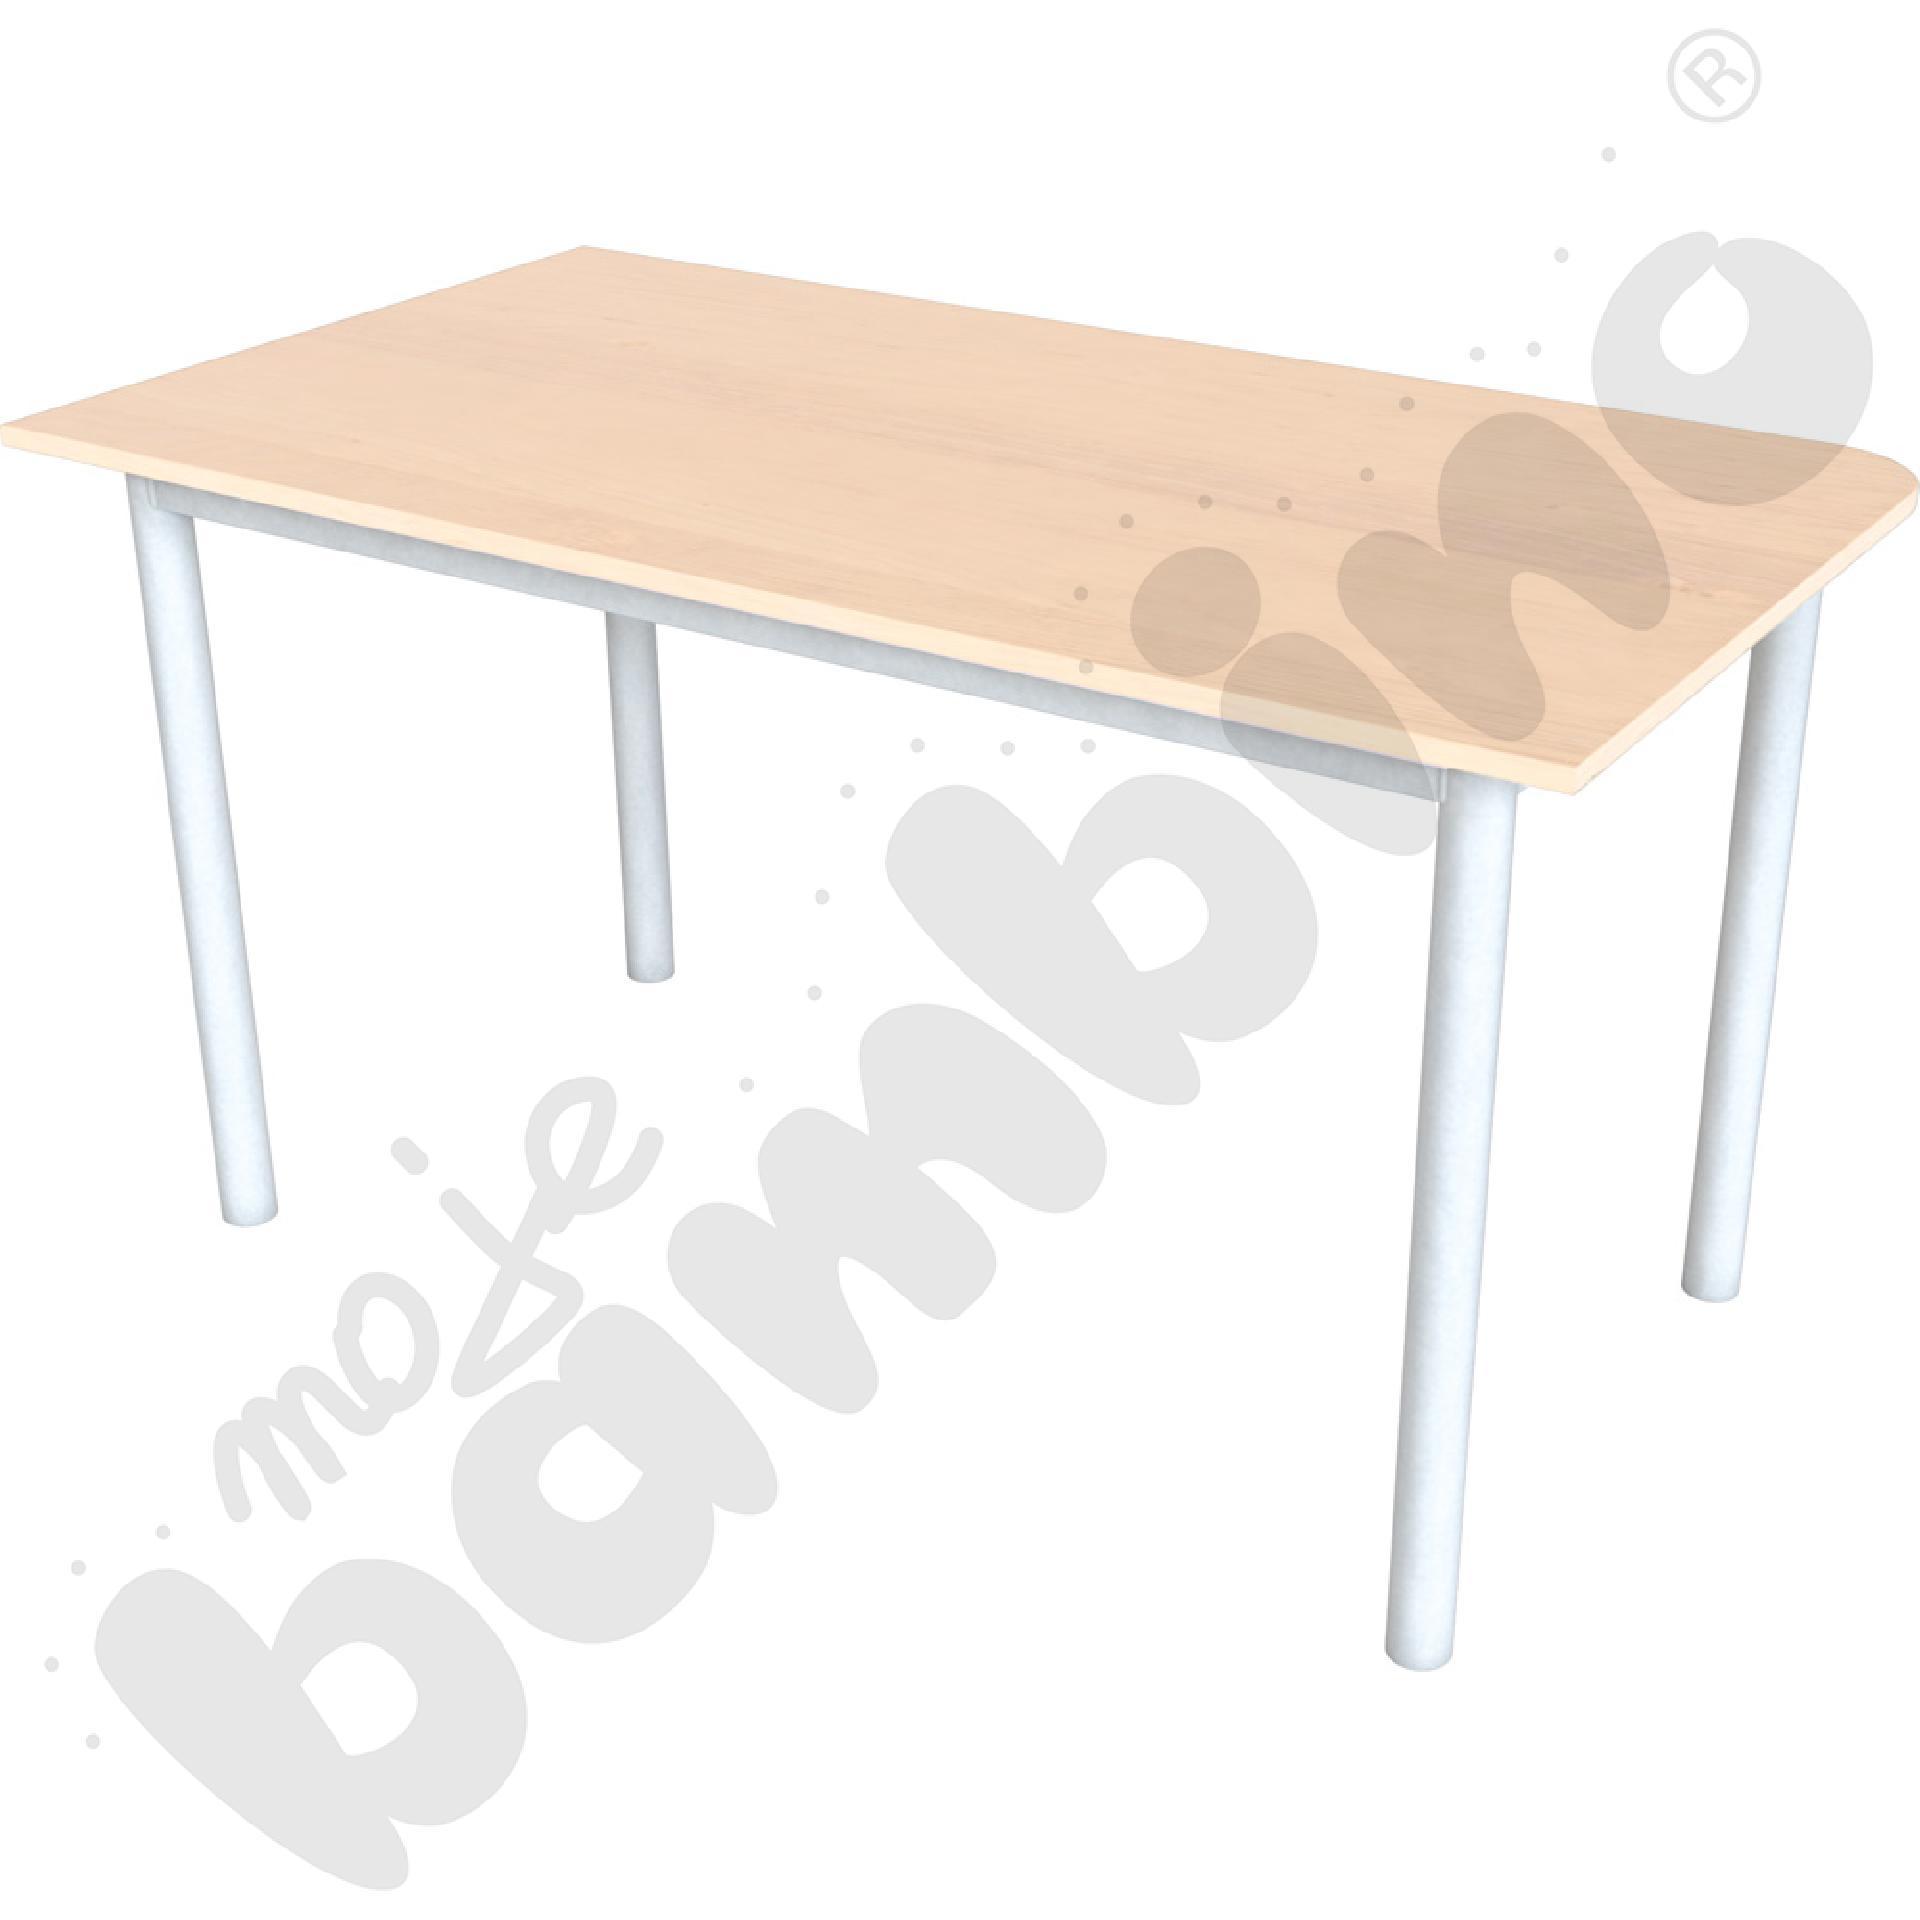 Stół konferencyjny lewy buk